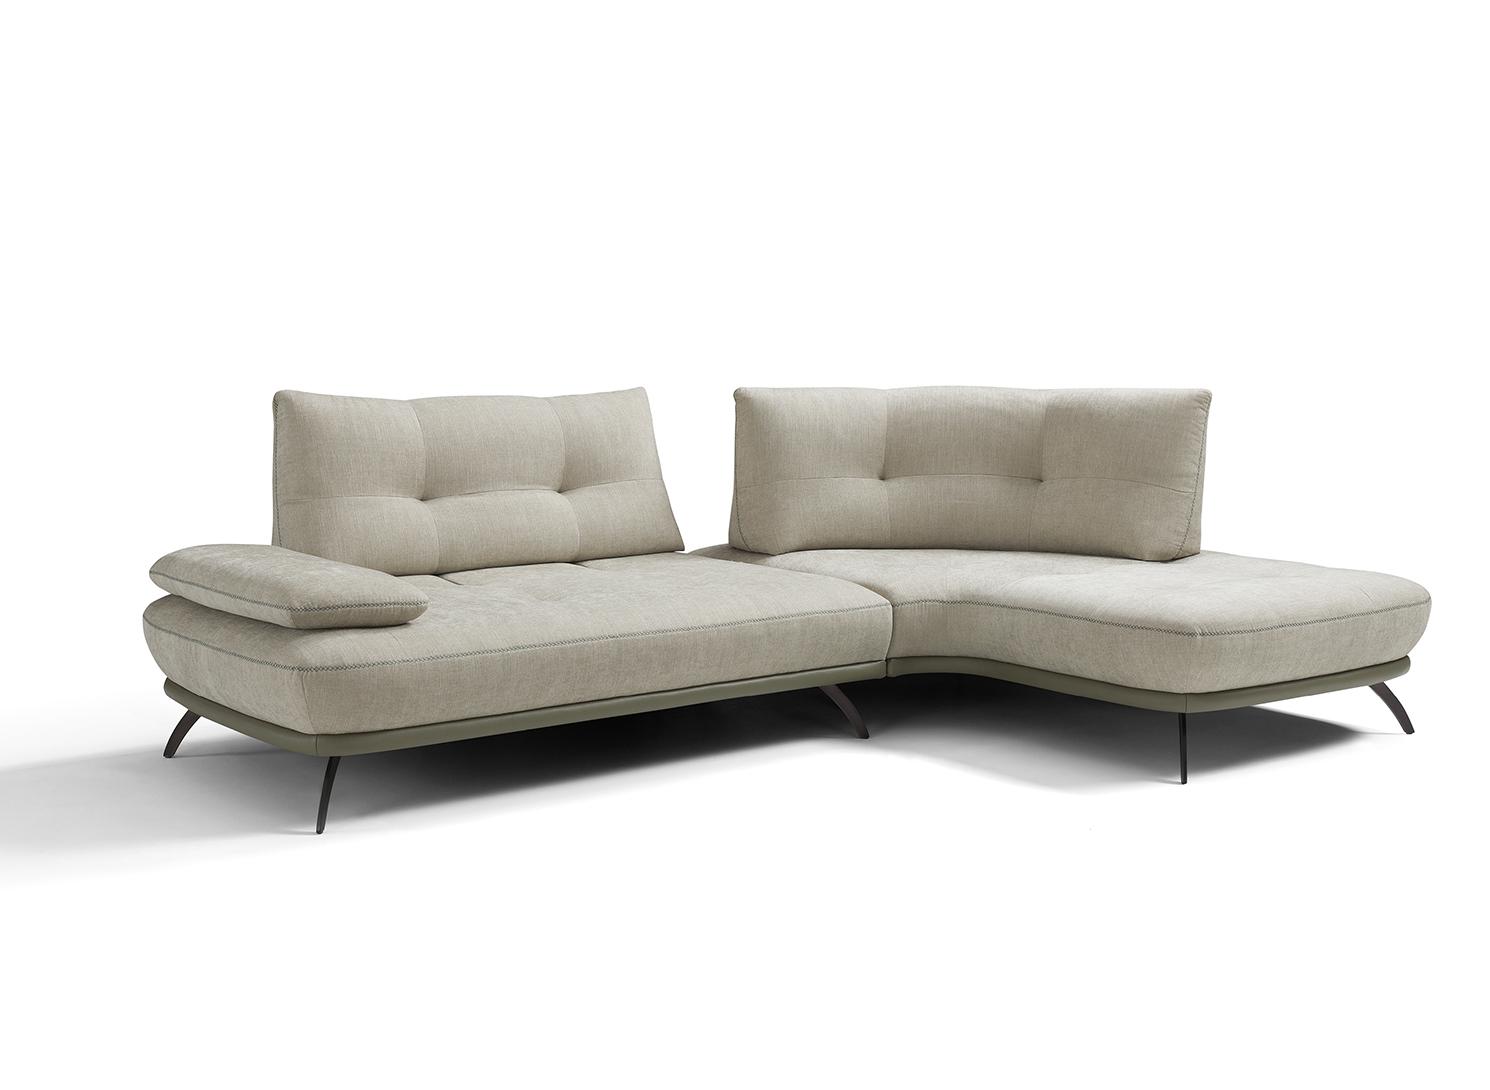 bogart-max-divani-contemporary-collection